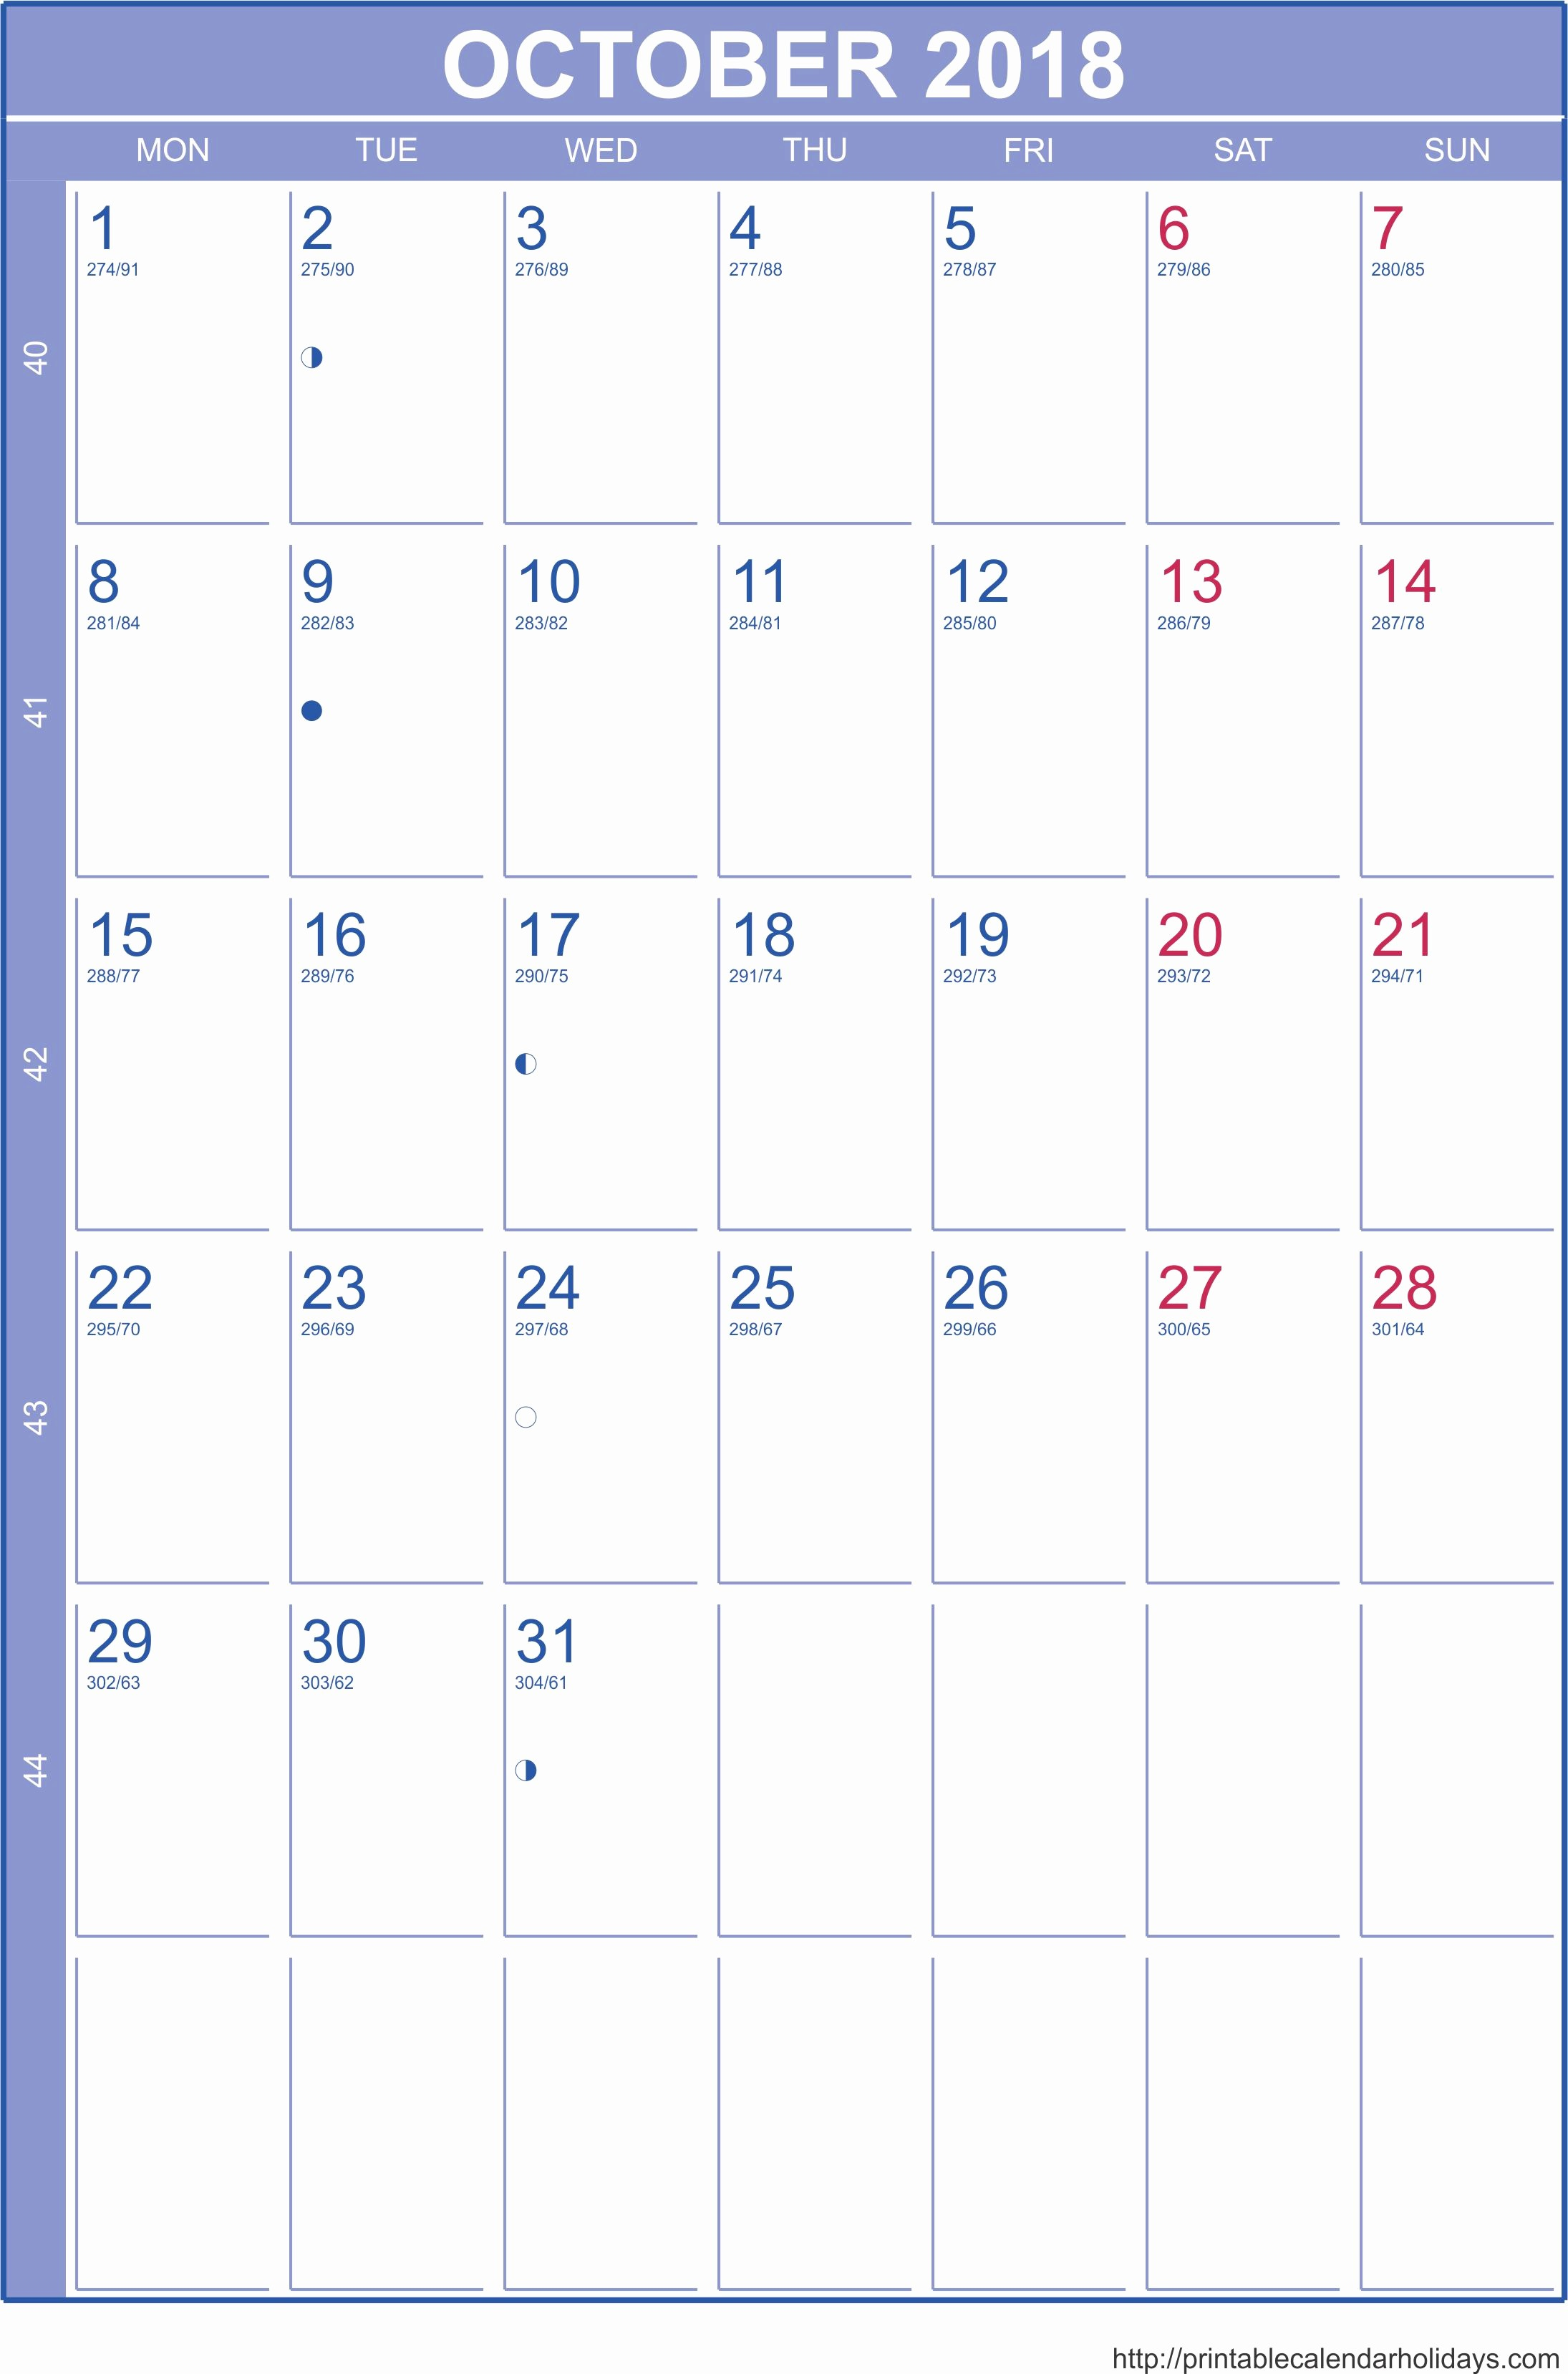 Free Printable Monthly Calendar Templates Best Of Monthly Calendars Archives Free Printable Calendar 2016